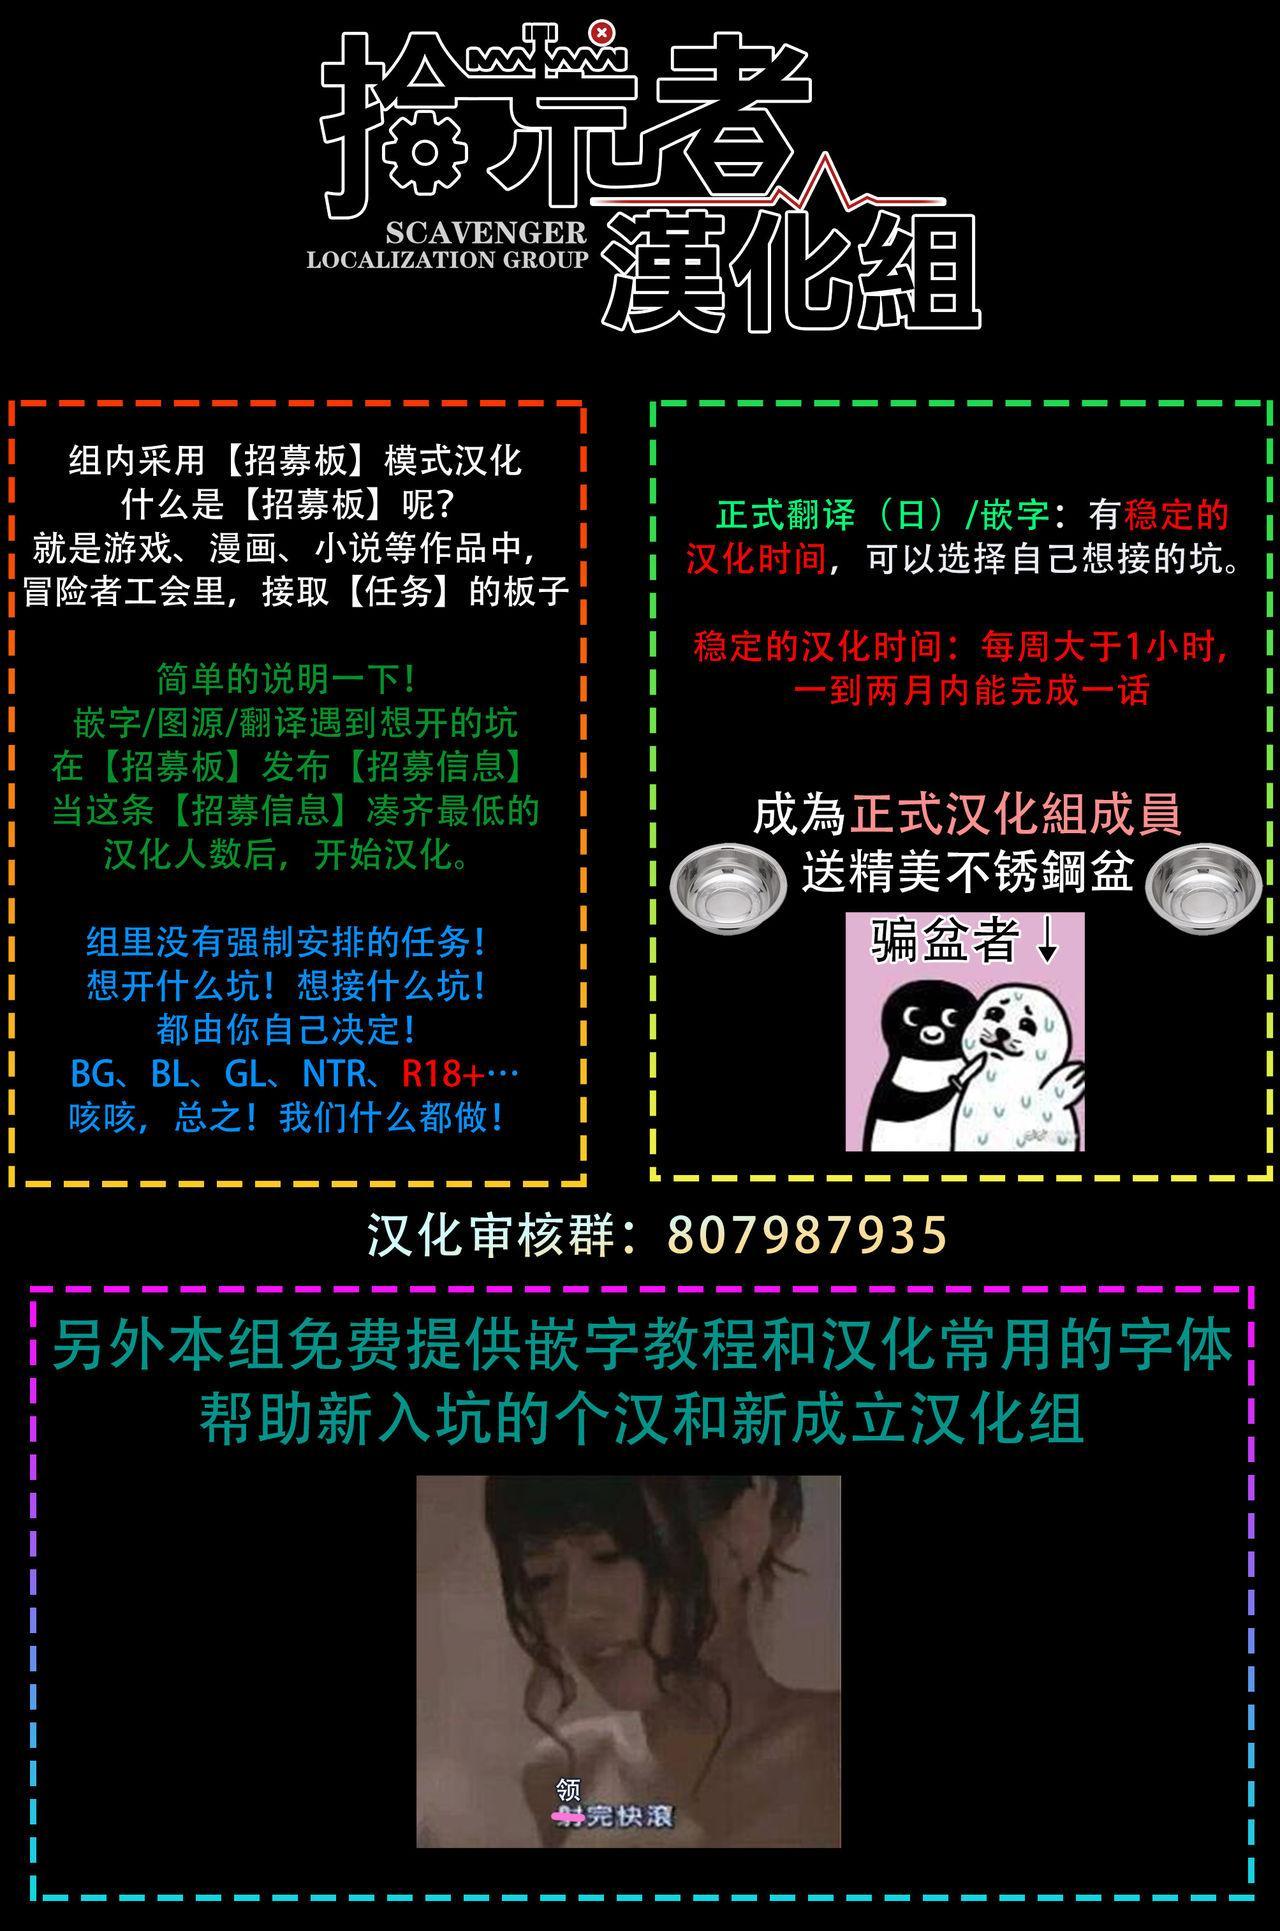 [Sagan Sagan] Old-fashioned Cupcake Ch. 1-2 [Chinese] [拾荒者汉化组] [Digital] 86